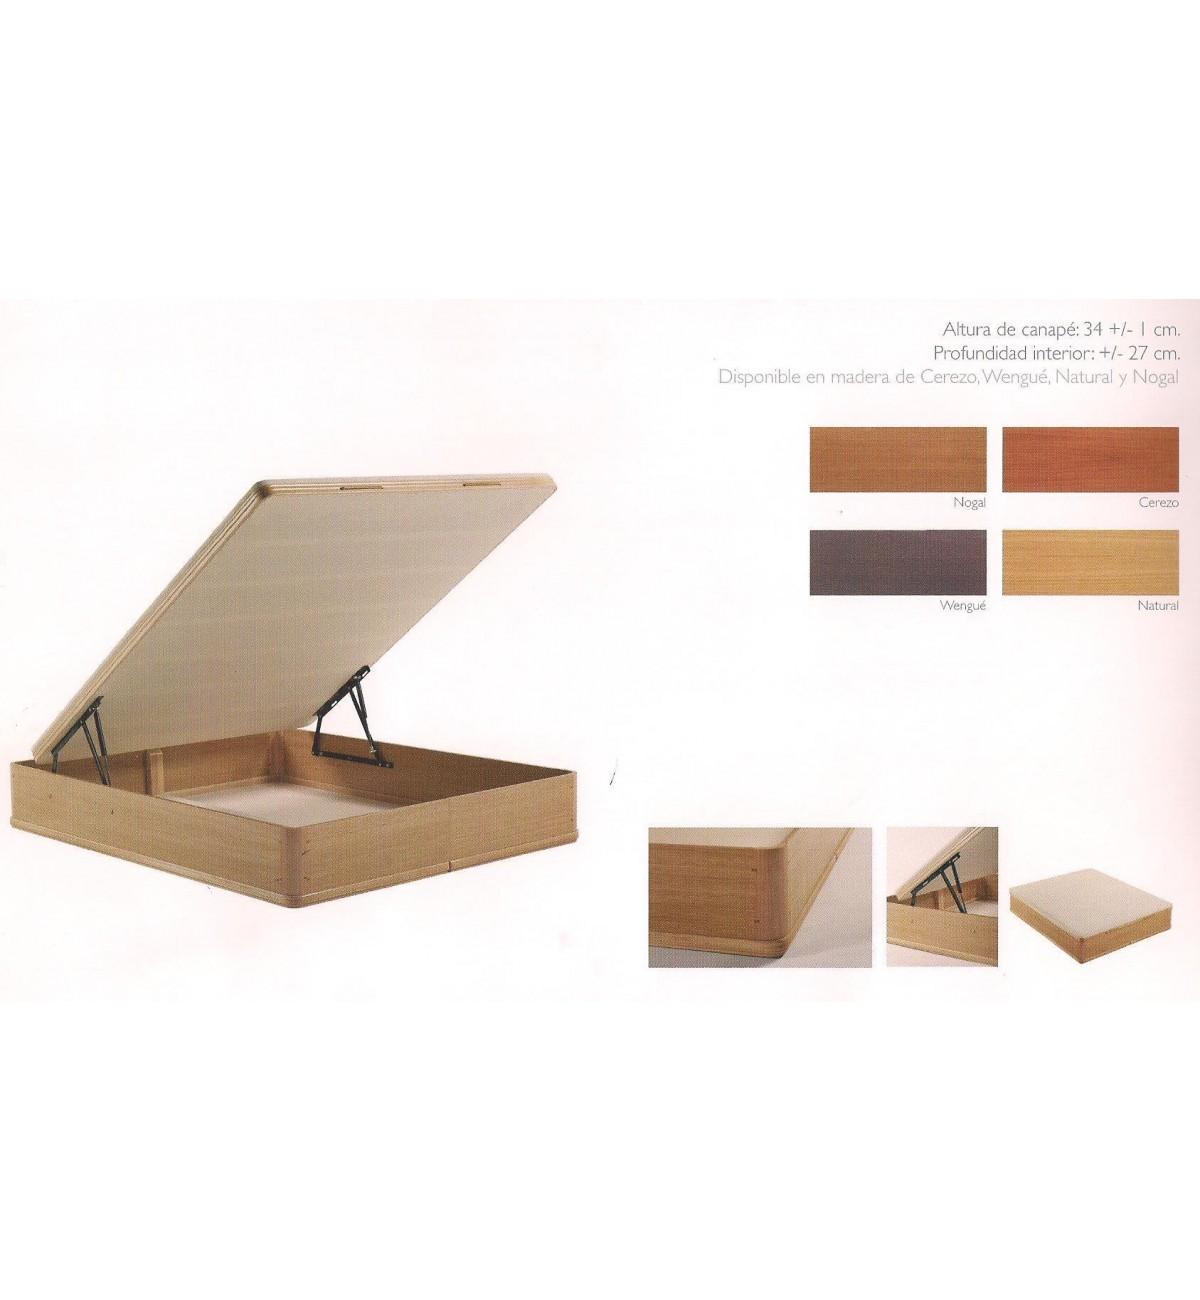 Canap abatible aspol dise o madera colchones online buen for Canape abatible